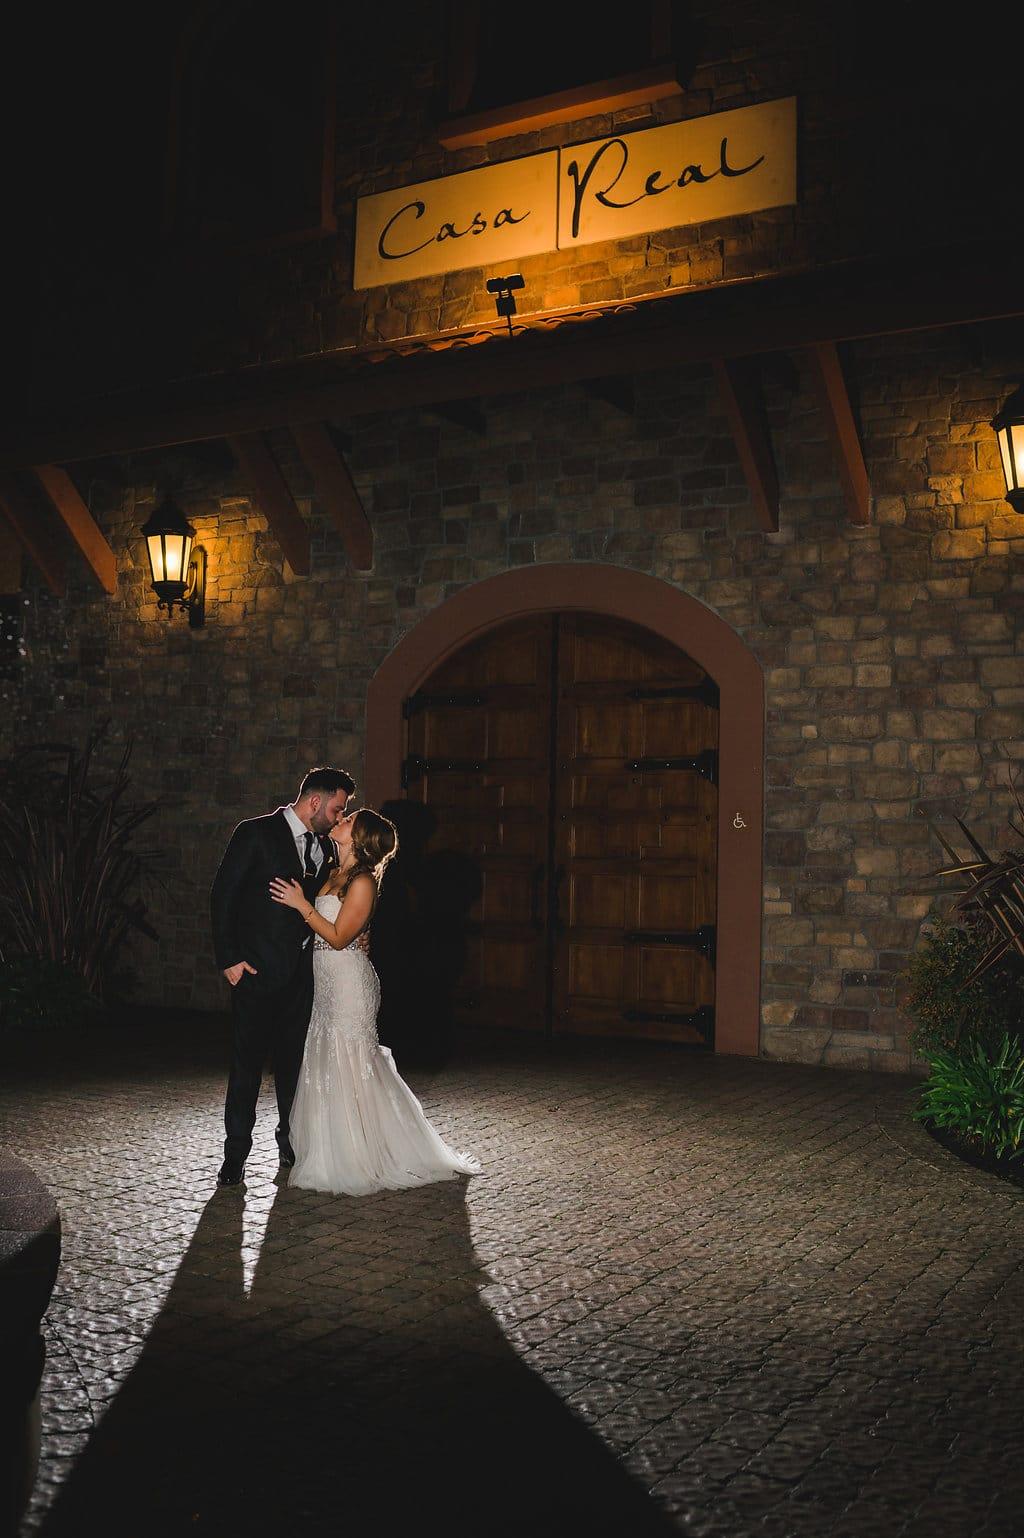 Laura and billy s lavish casa real wedding fantasy sound for Casa actual